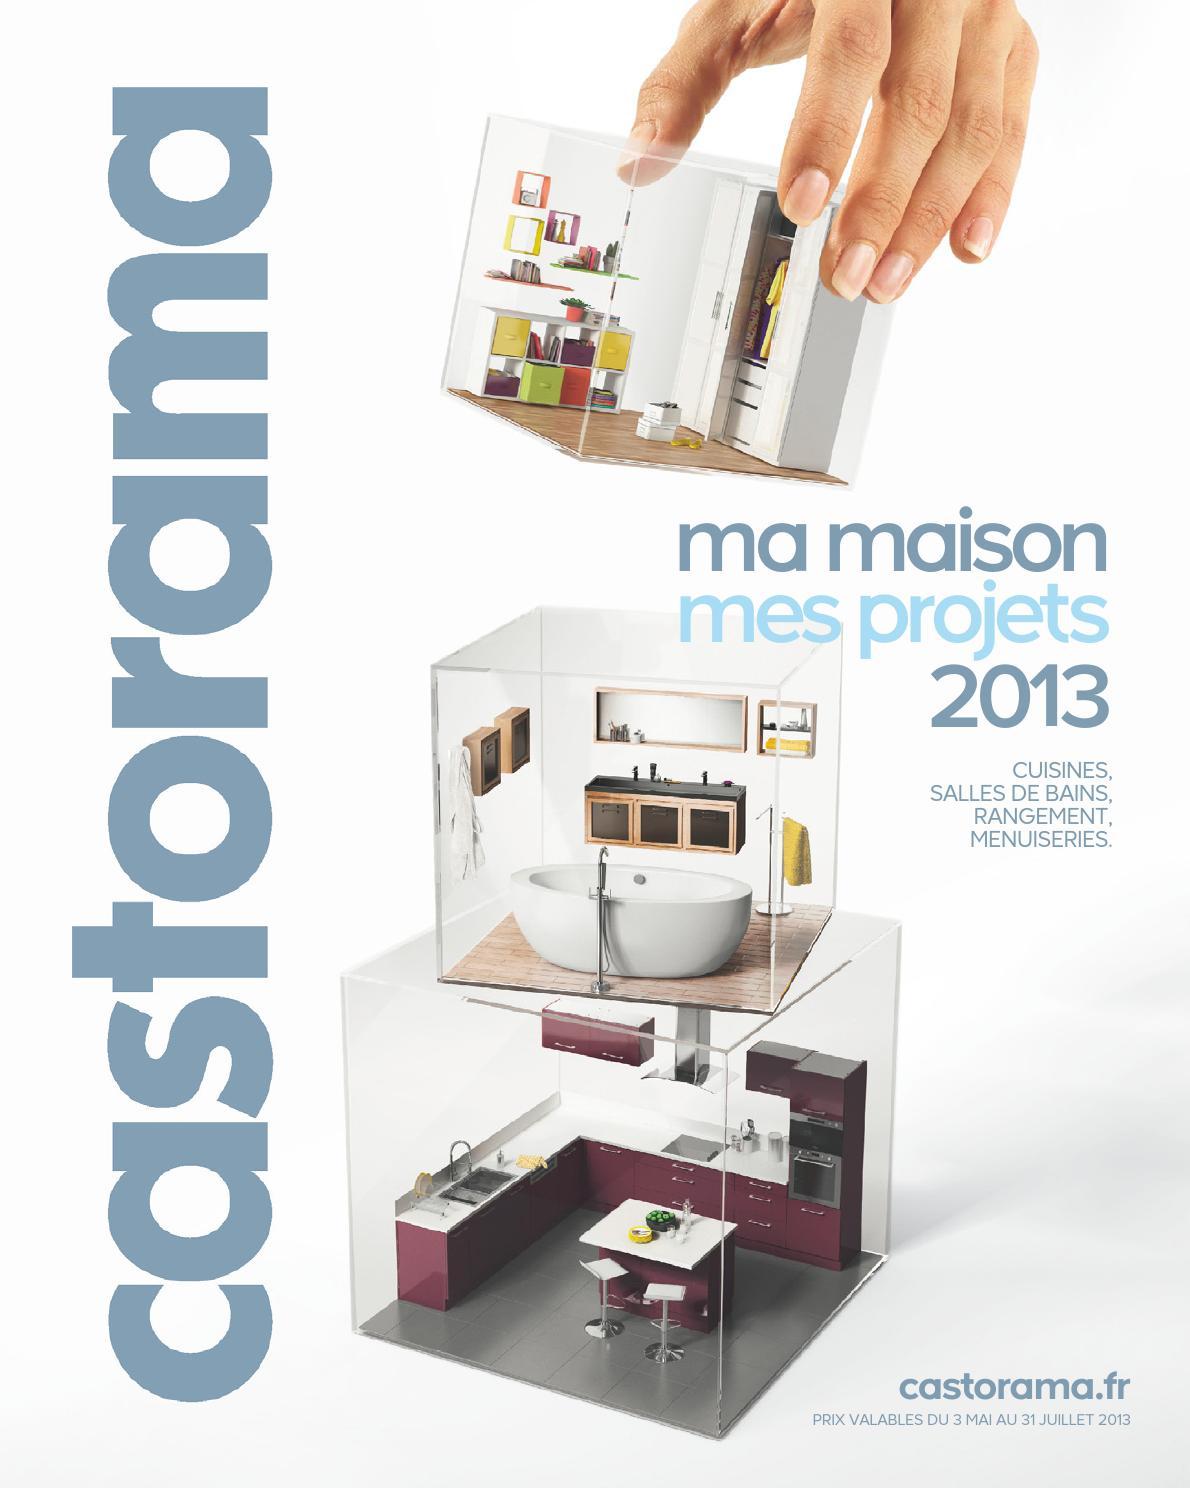 Catalogue Castorama Maison By Margot Ziegler - Issuu destiné Bille Polystyrène Isolation Castorama